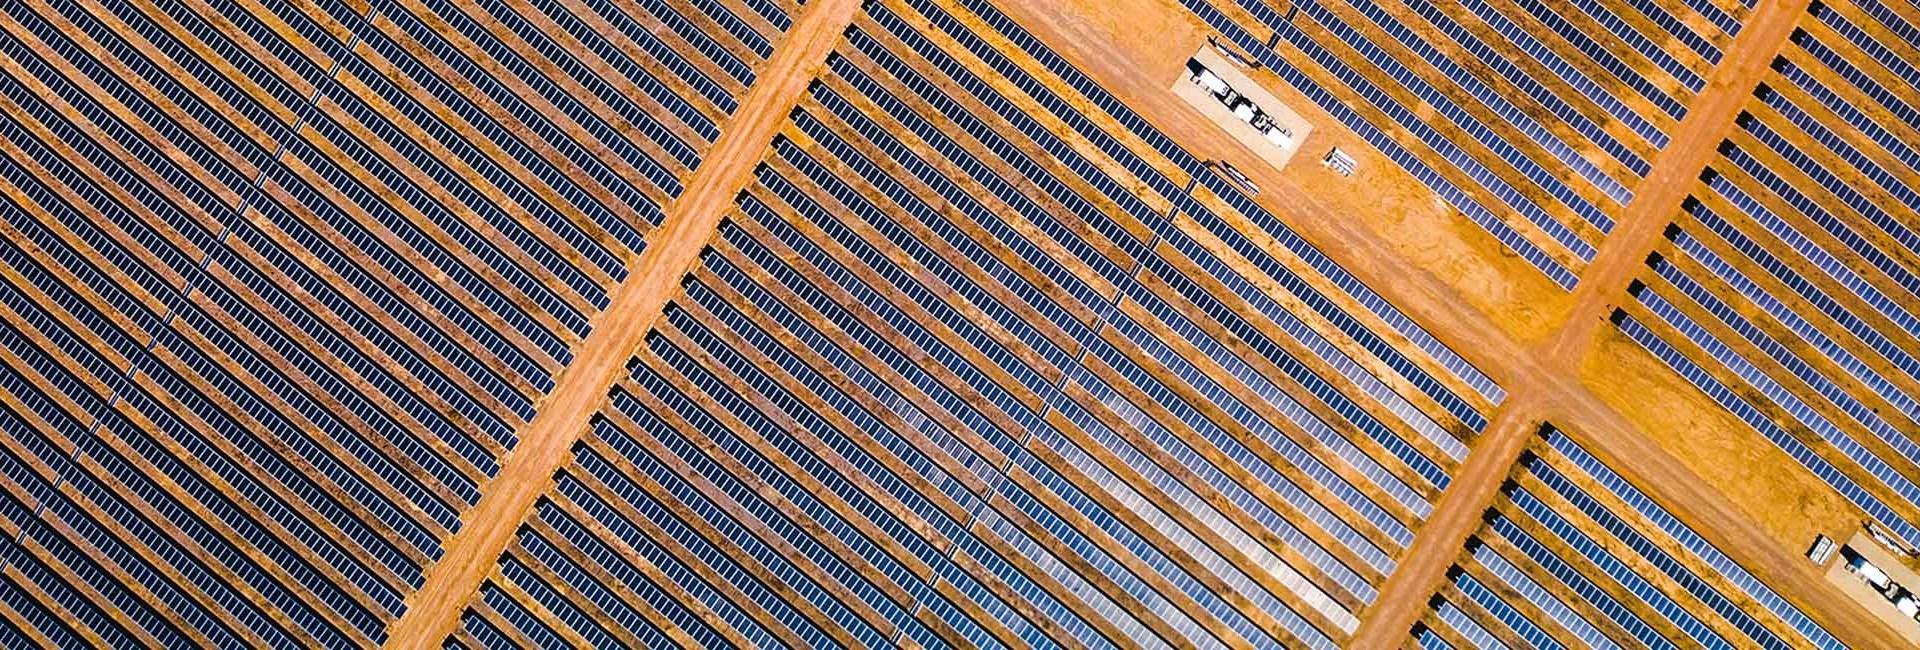 Aerial photo of Australian solar farm